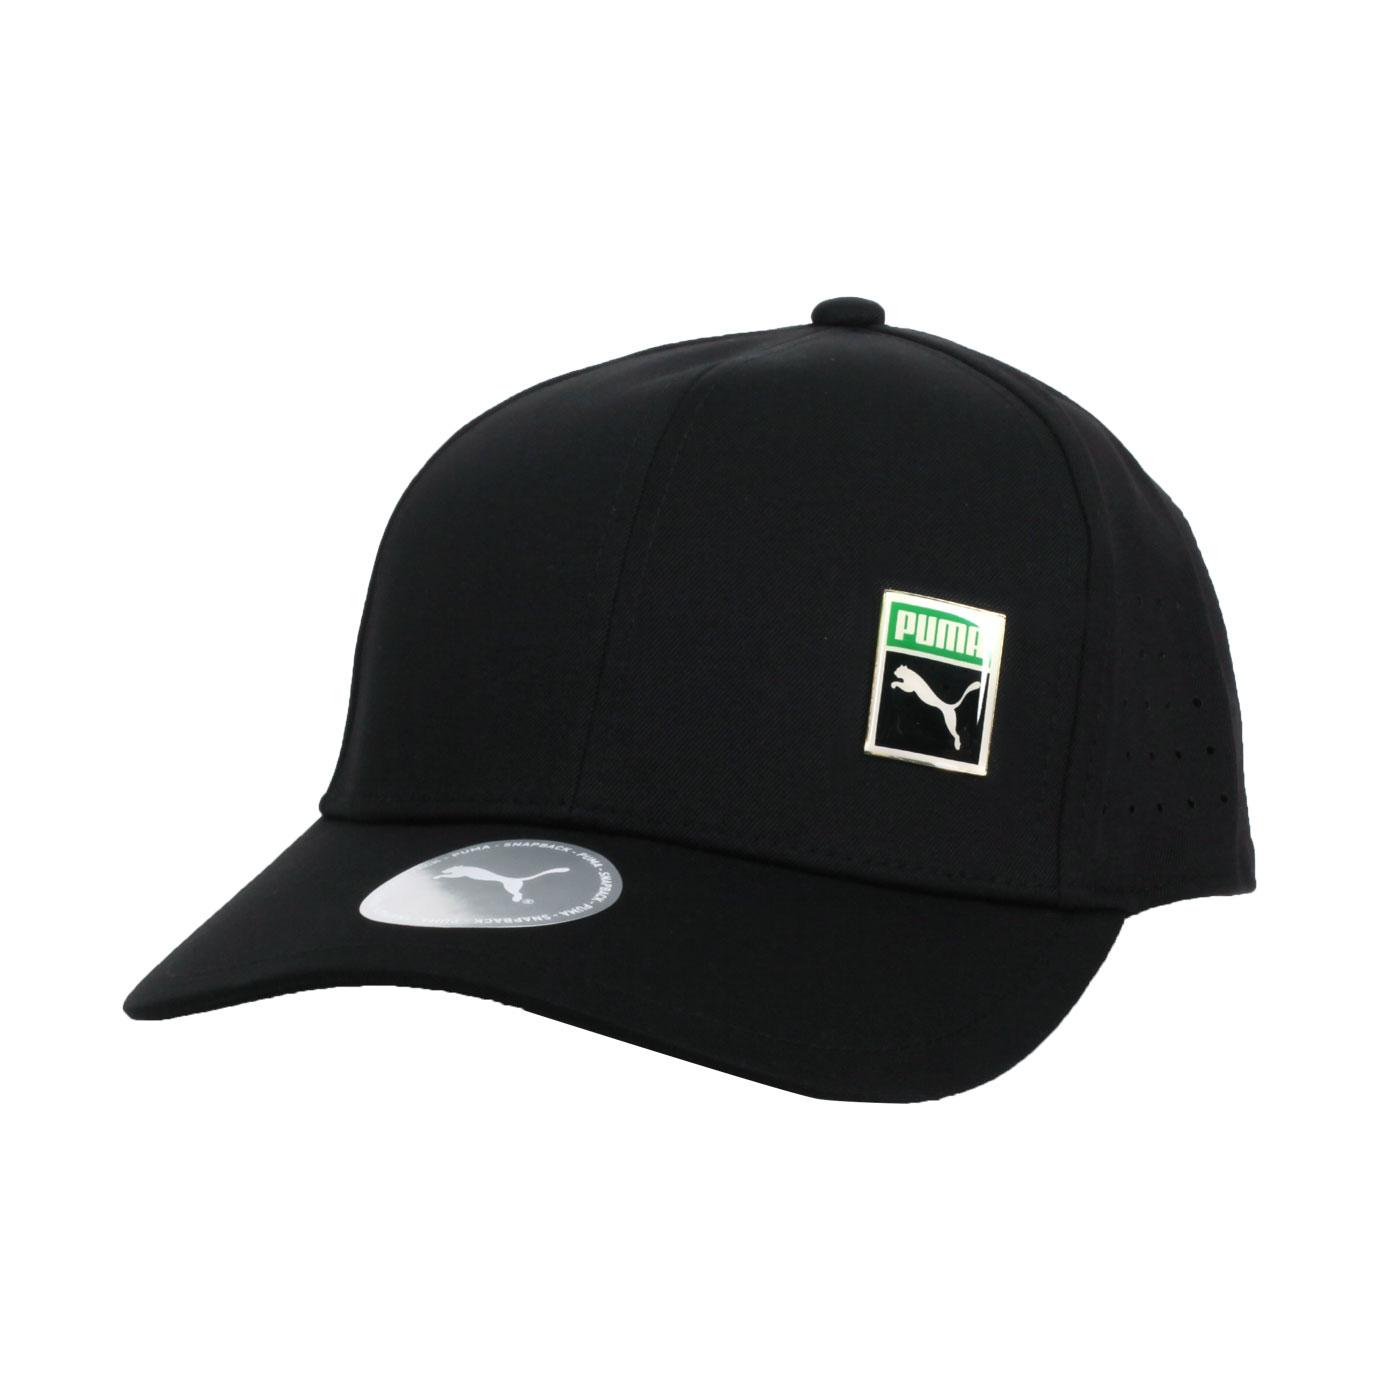 PUMA 流行系列棒球帽 02352901